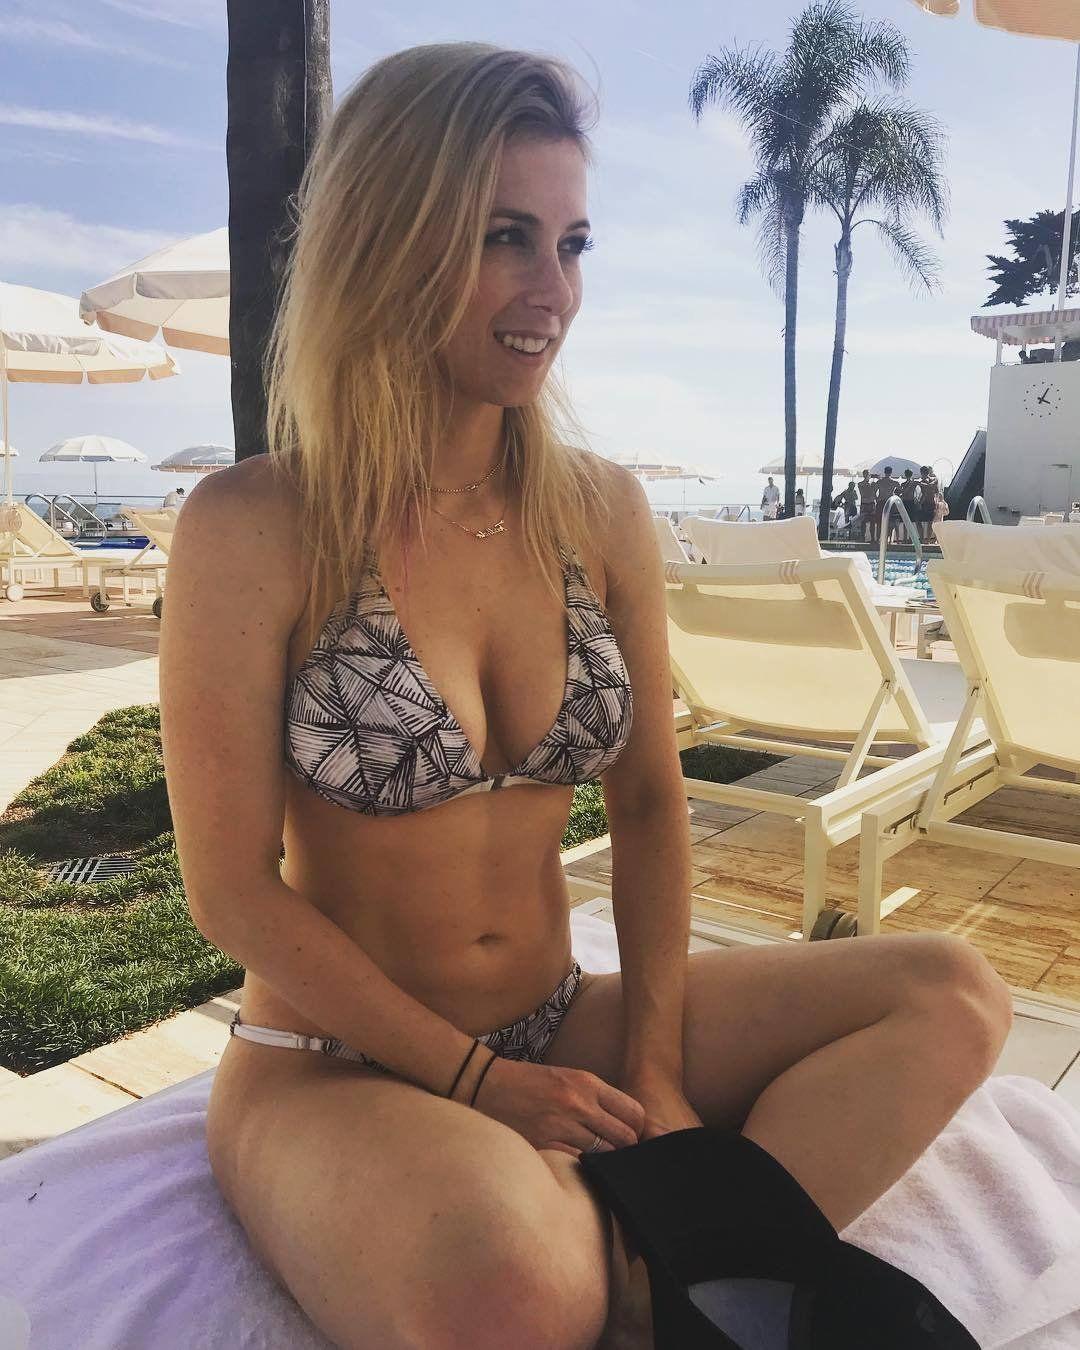 Iliza shlesinger bikini